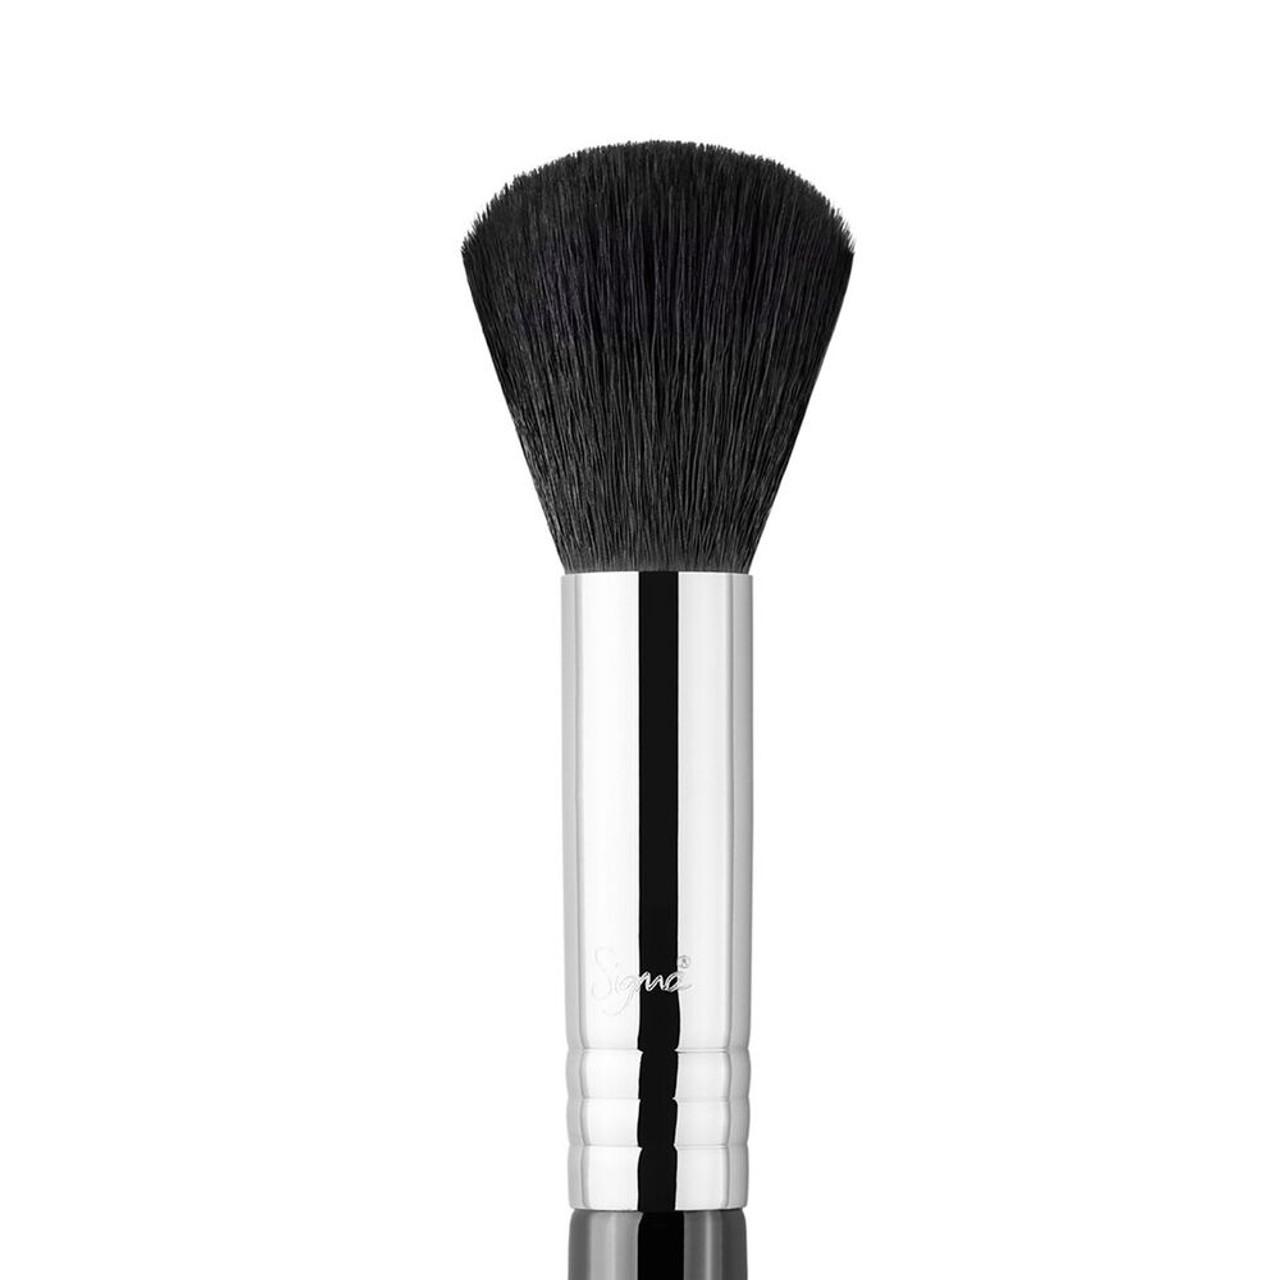 Sigma Beauty F05 - Small Contour Brush - Chrome